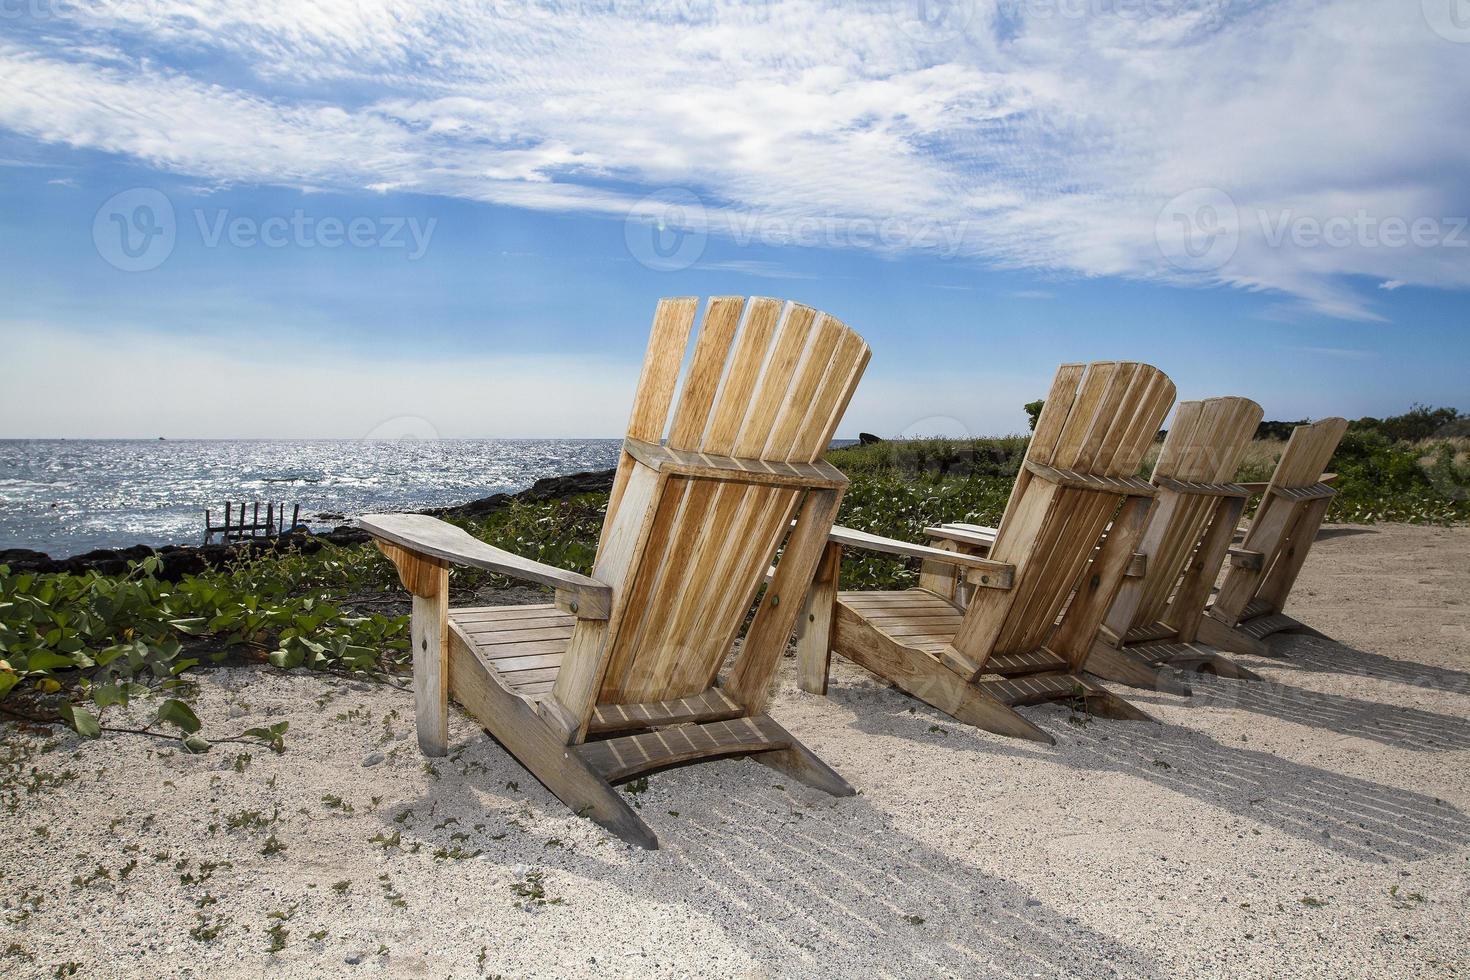 sedie adirondack in spiaggia foto